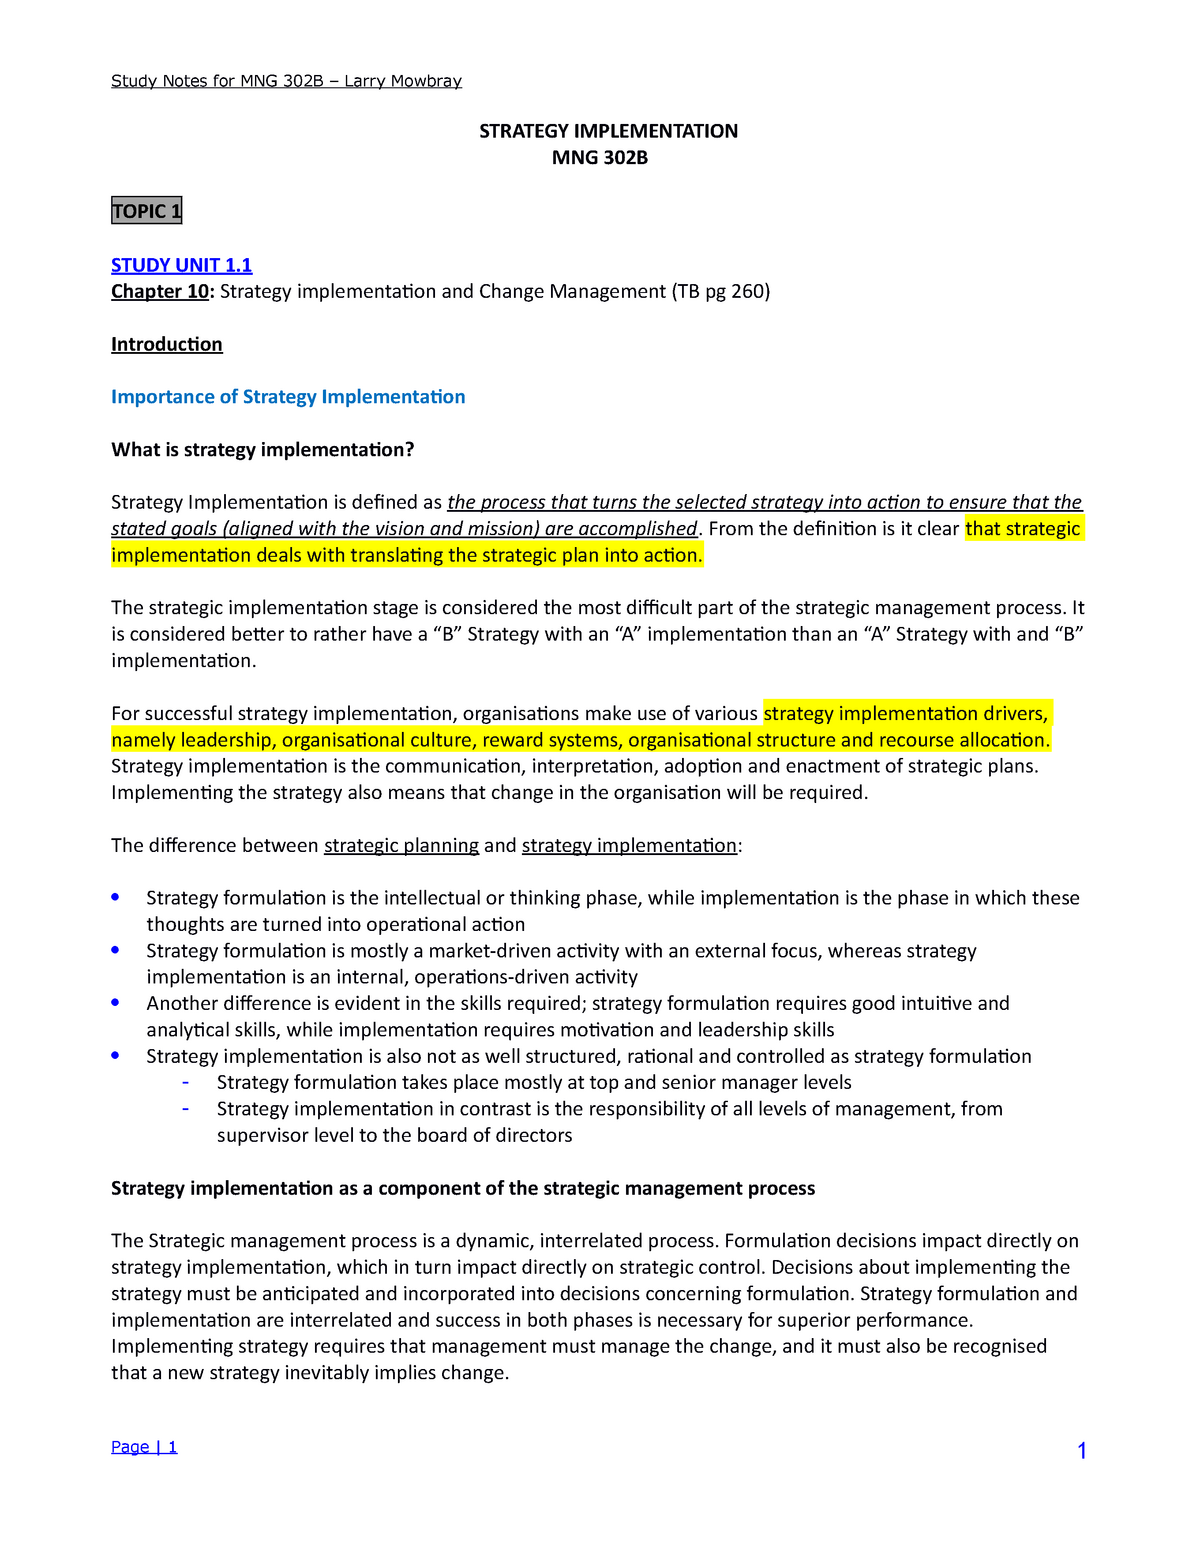 MNG3702-detailed summary - MNG3702 - UNISA - StuDocu